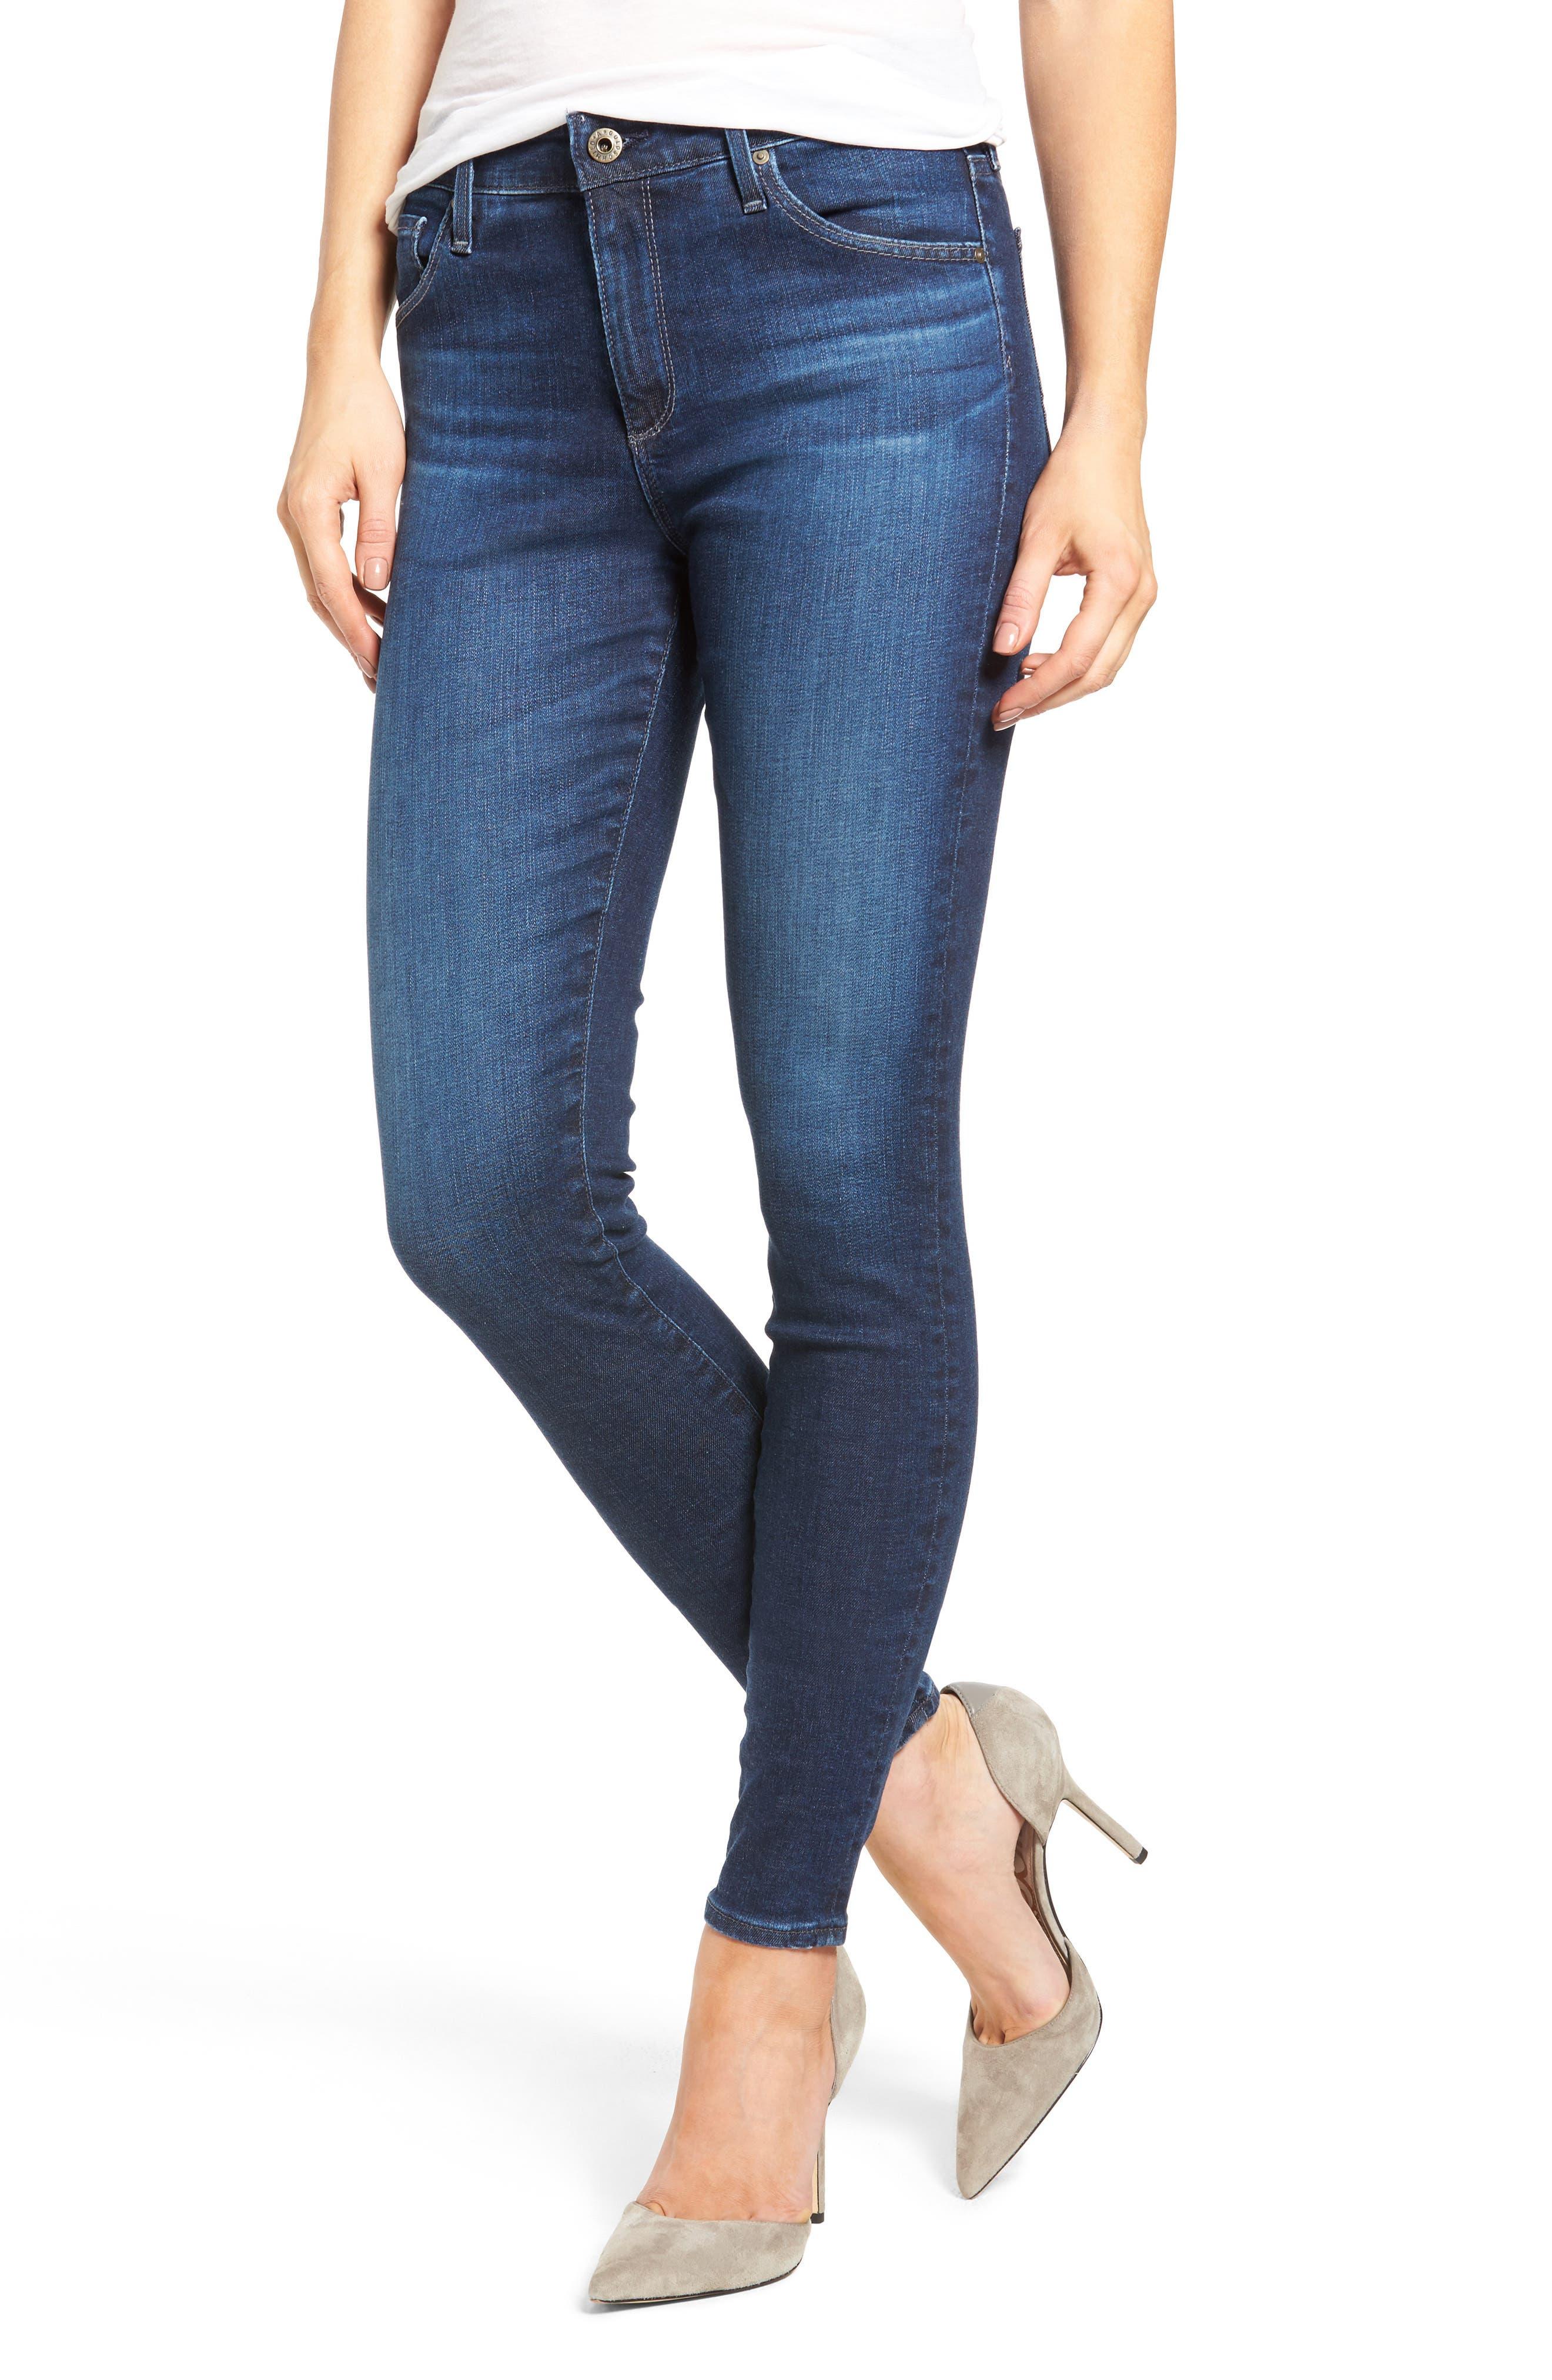 'The Farrah' High Rise Skinny Jeans,                         Main,                         color, Paradox Blue